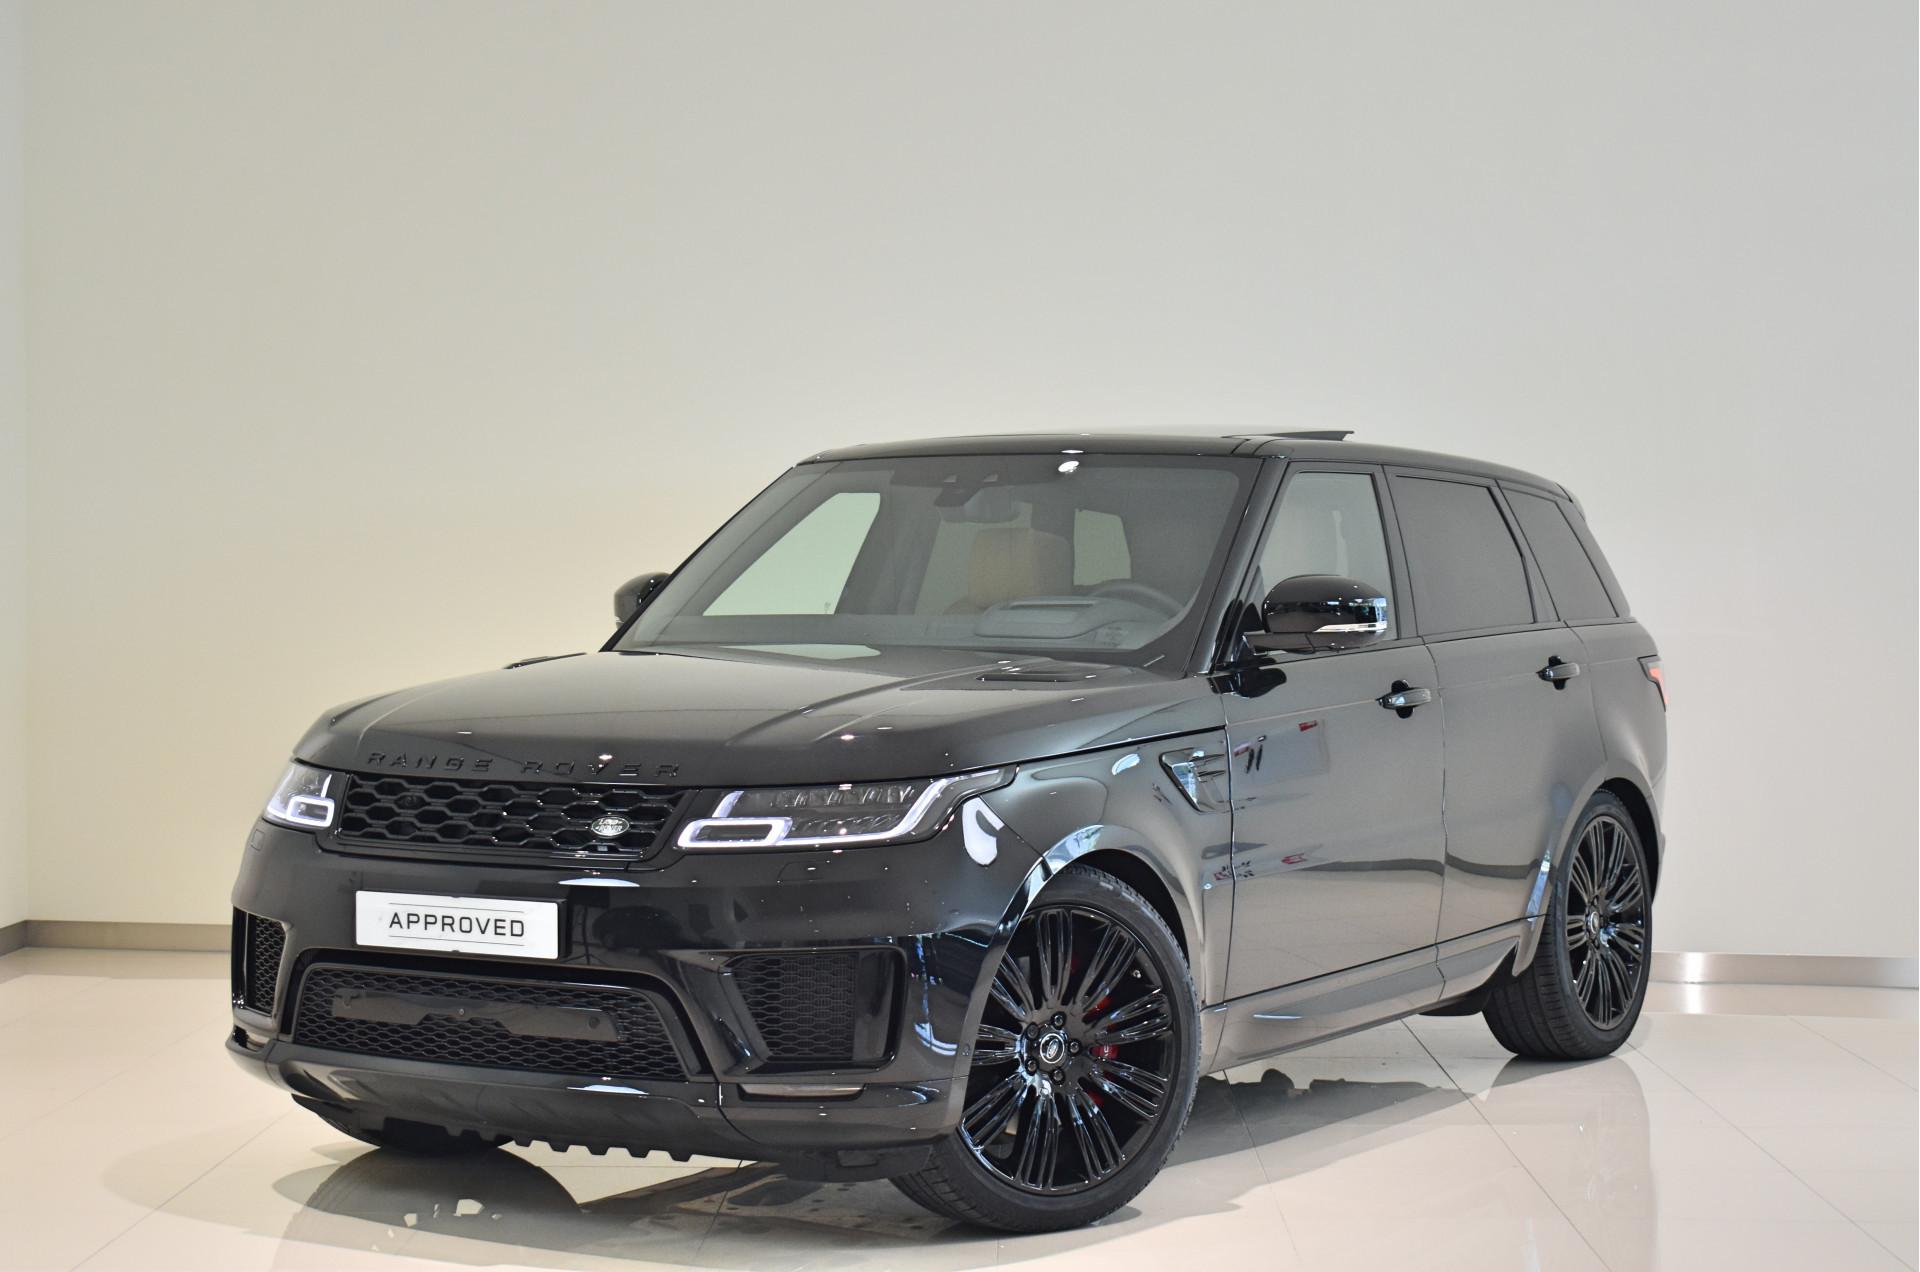 Land Rover Range Rover Sport 5.0 V8 SC Autobiography Dynamic - Afbeelding 1